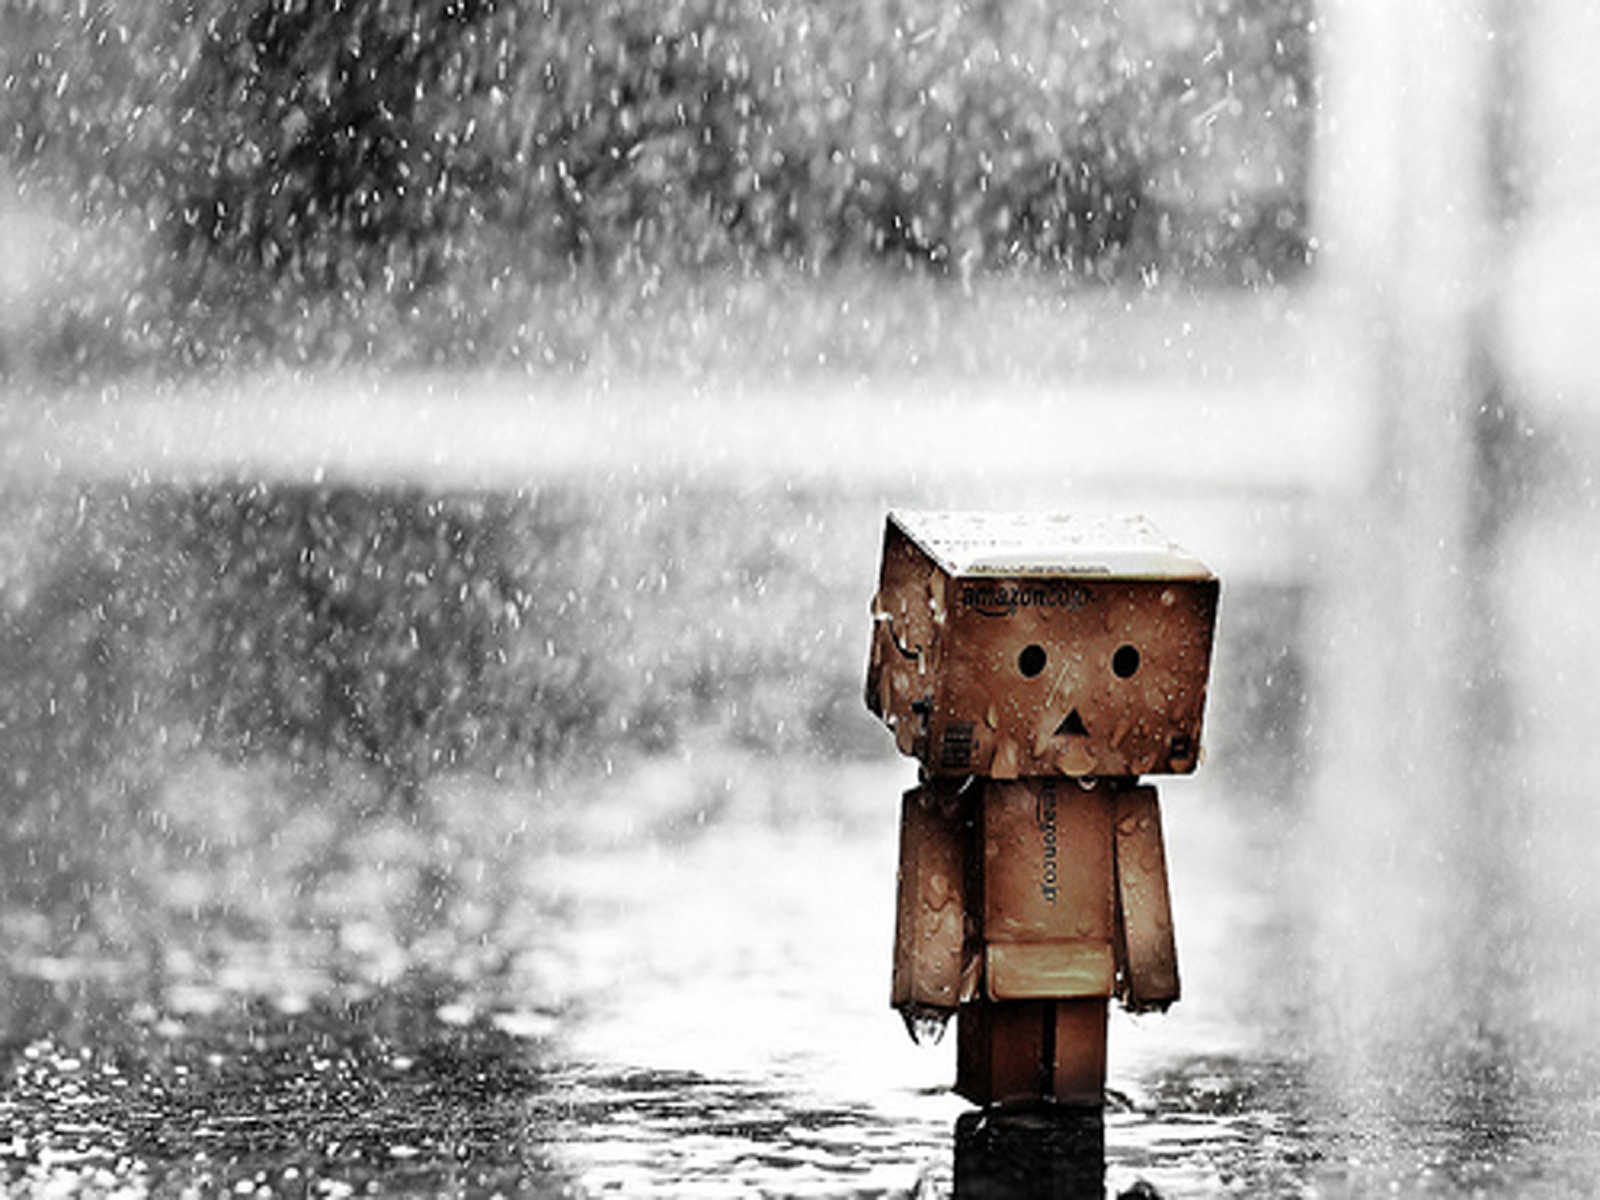 Rain Wallpapers Desktop HD Wallpapers Pictures Images 1600x1200